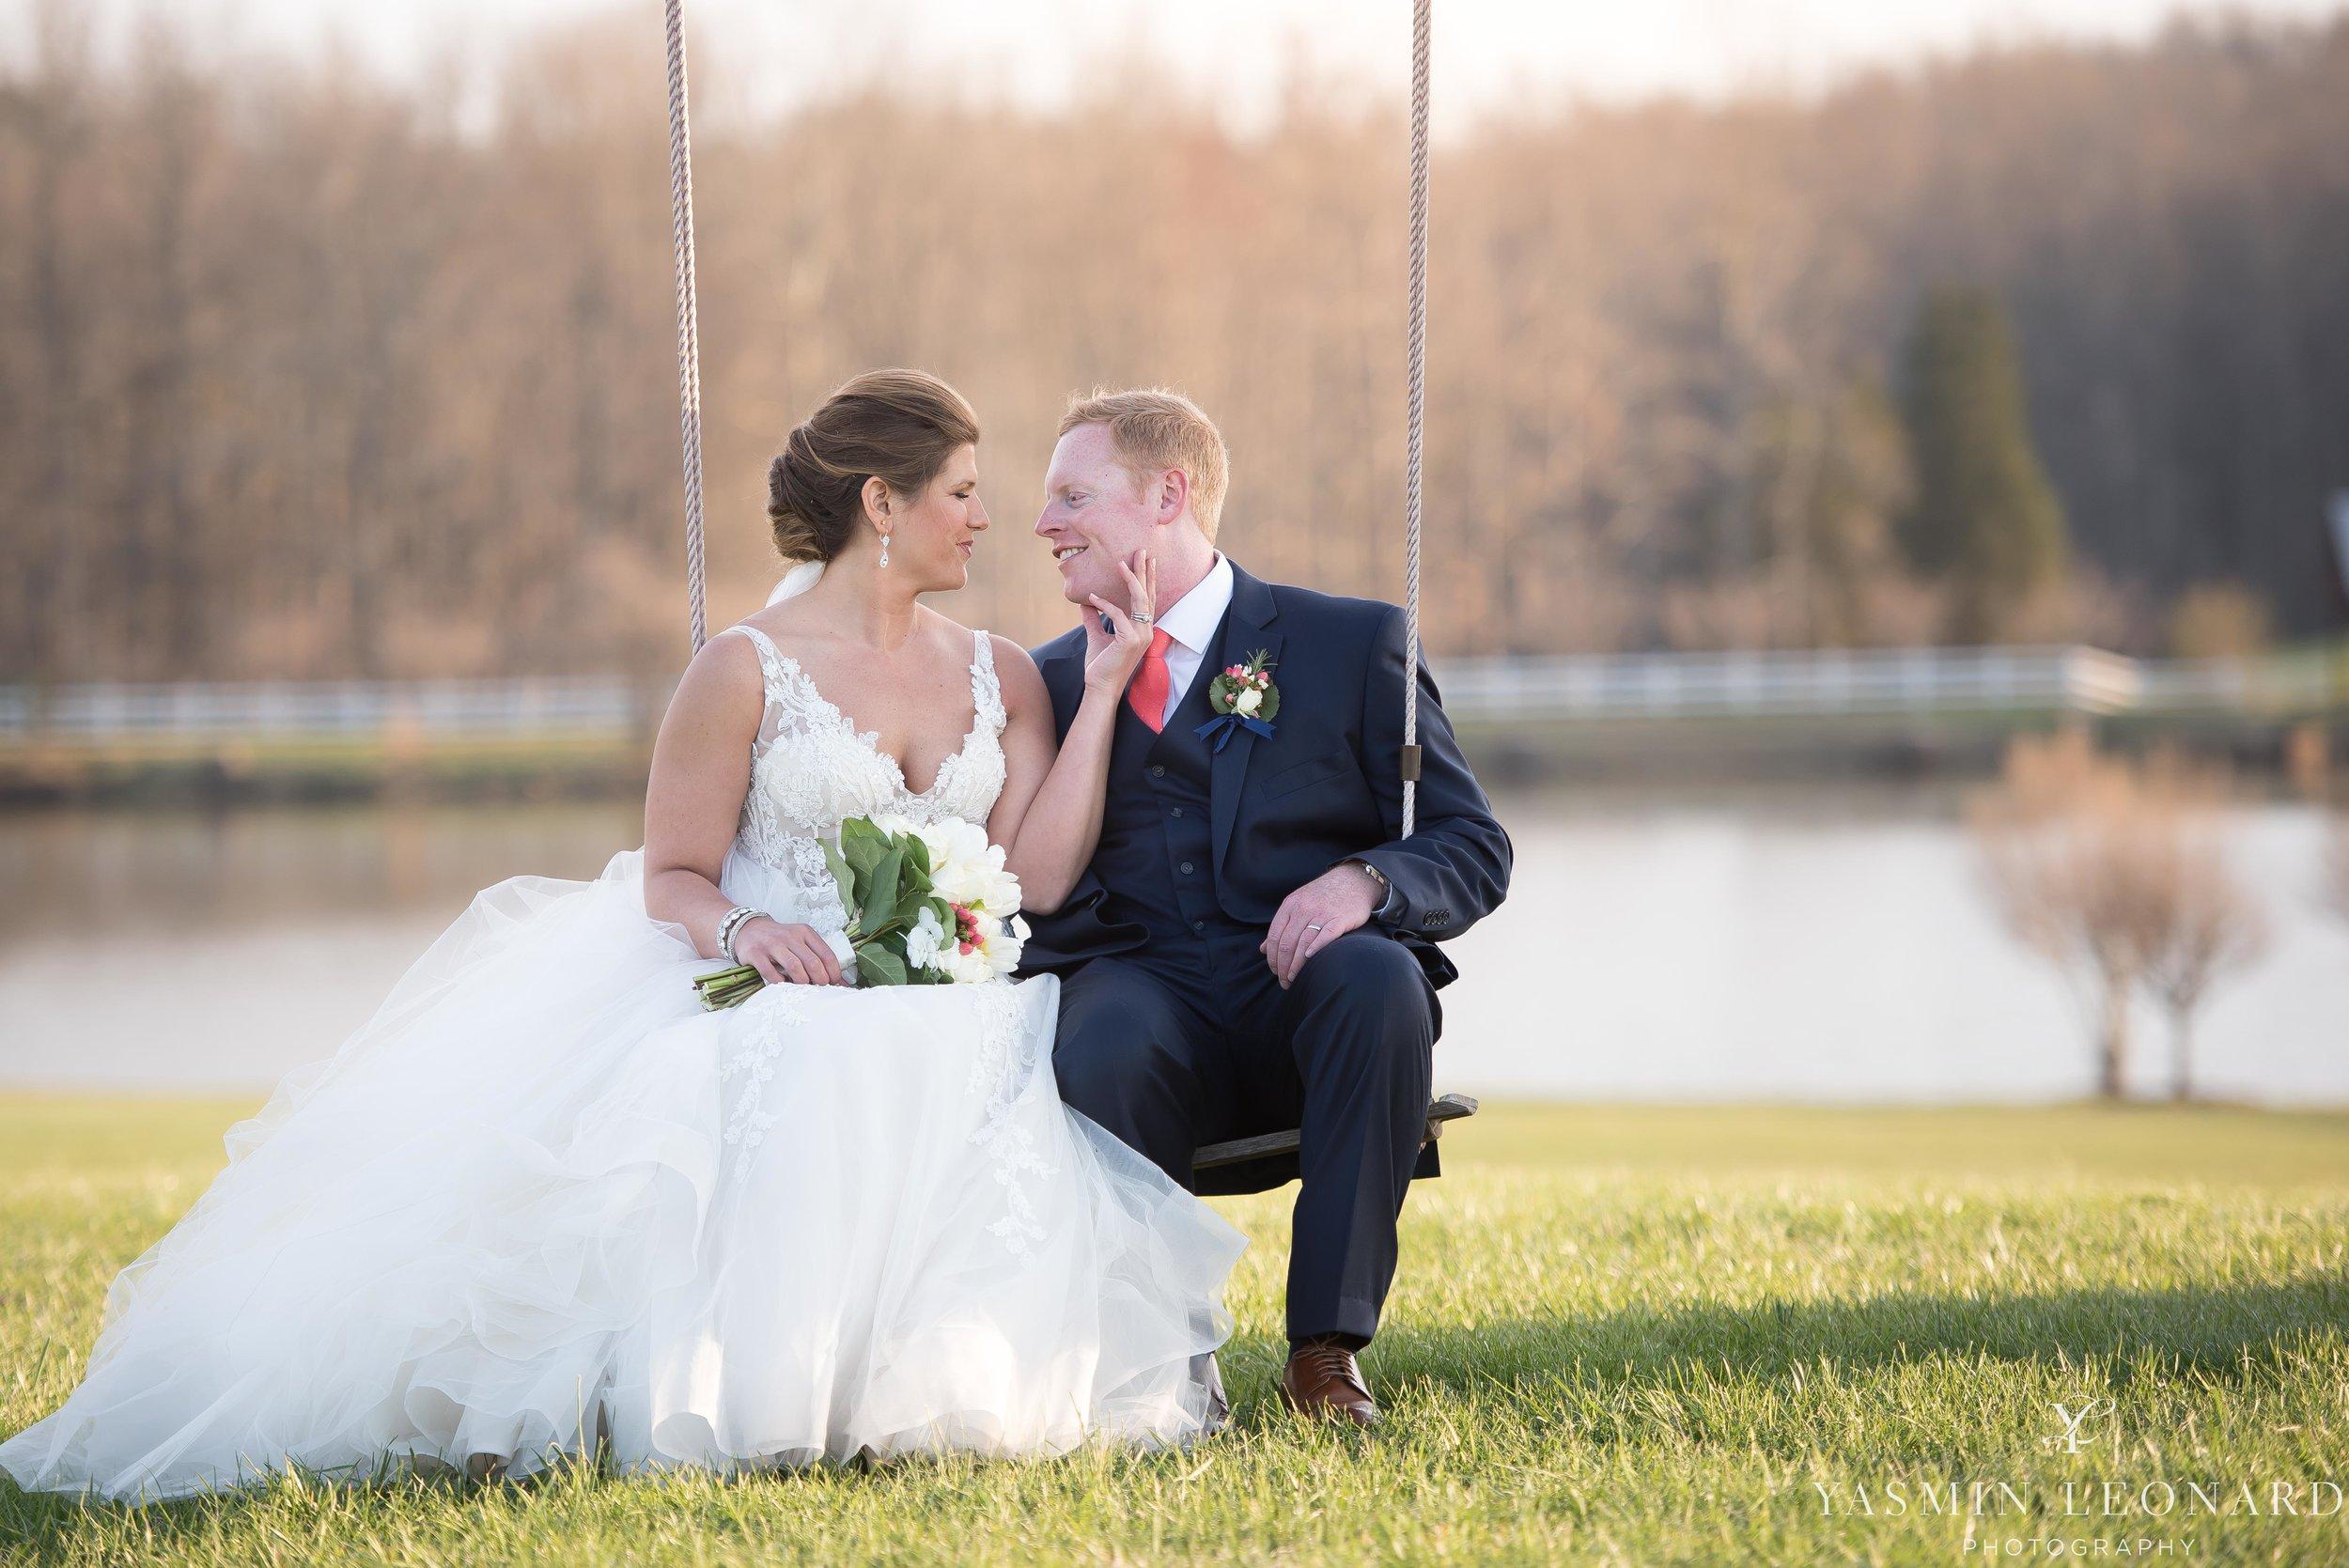 Adaumont Farm - Adaumont Farm Weddings - Trinity Weddings - NC Weddings - Yasmin Leonard Photography-52.jpg